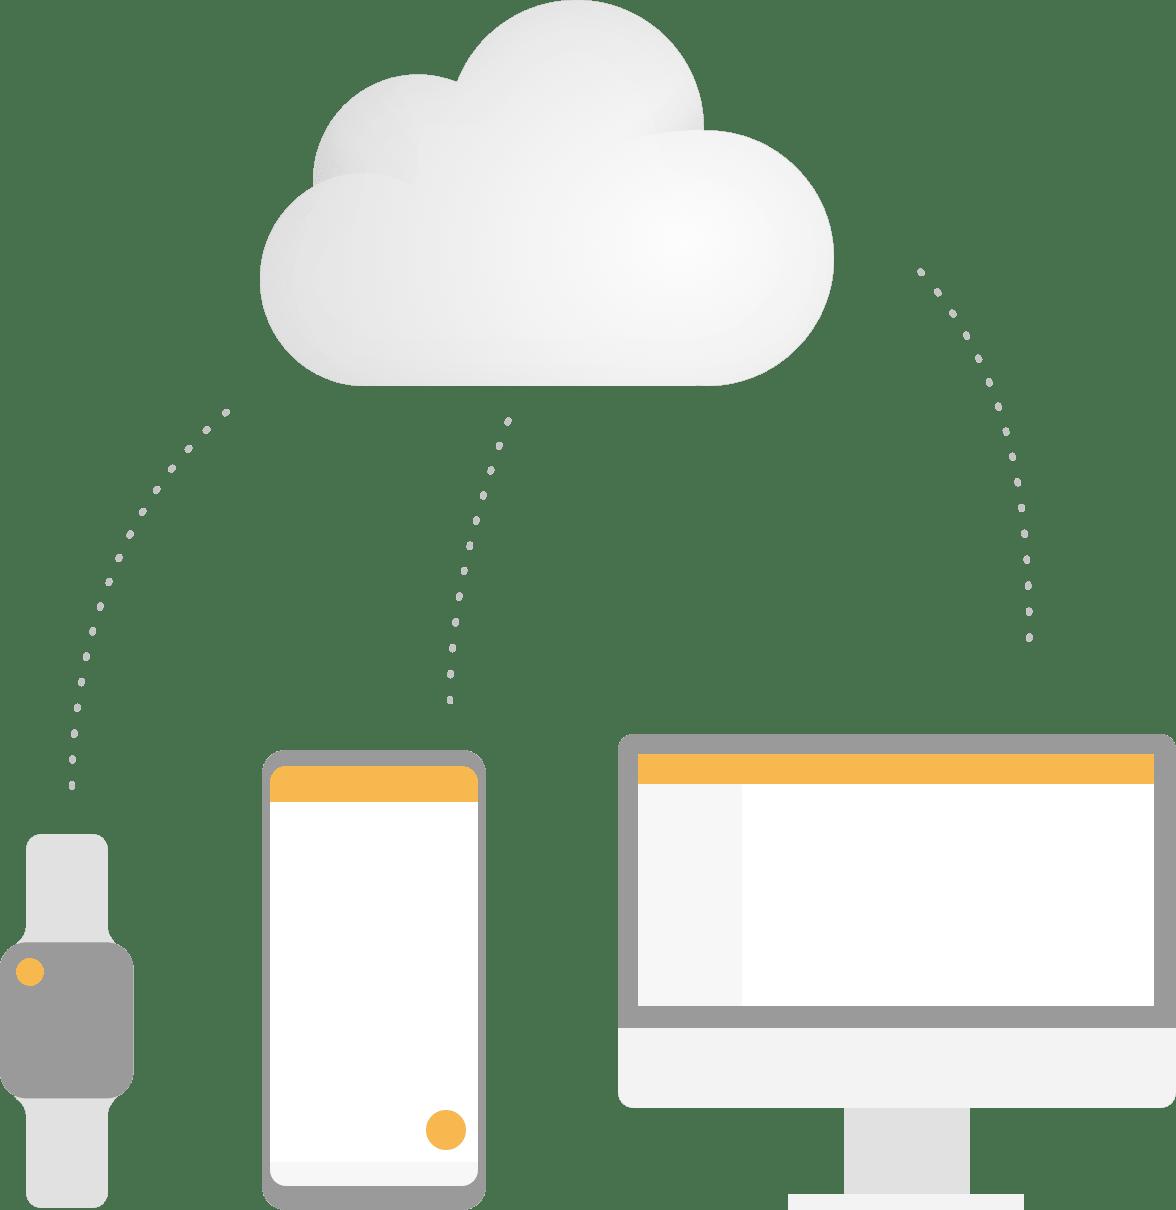 Erhalte automatische Backups deiner Daten